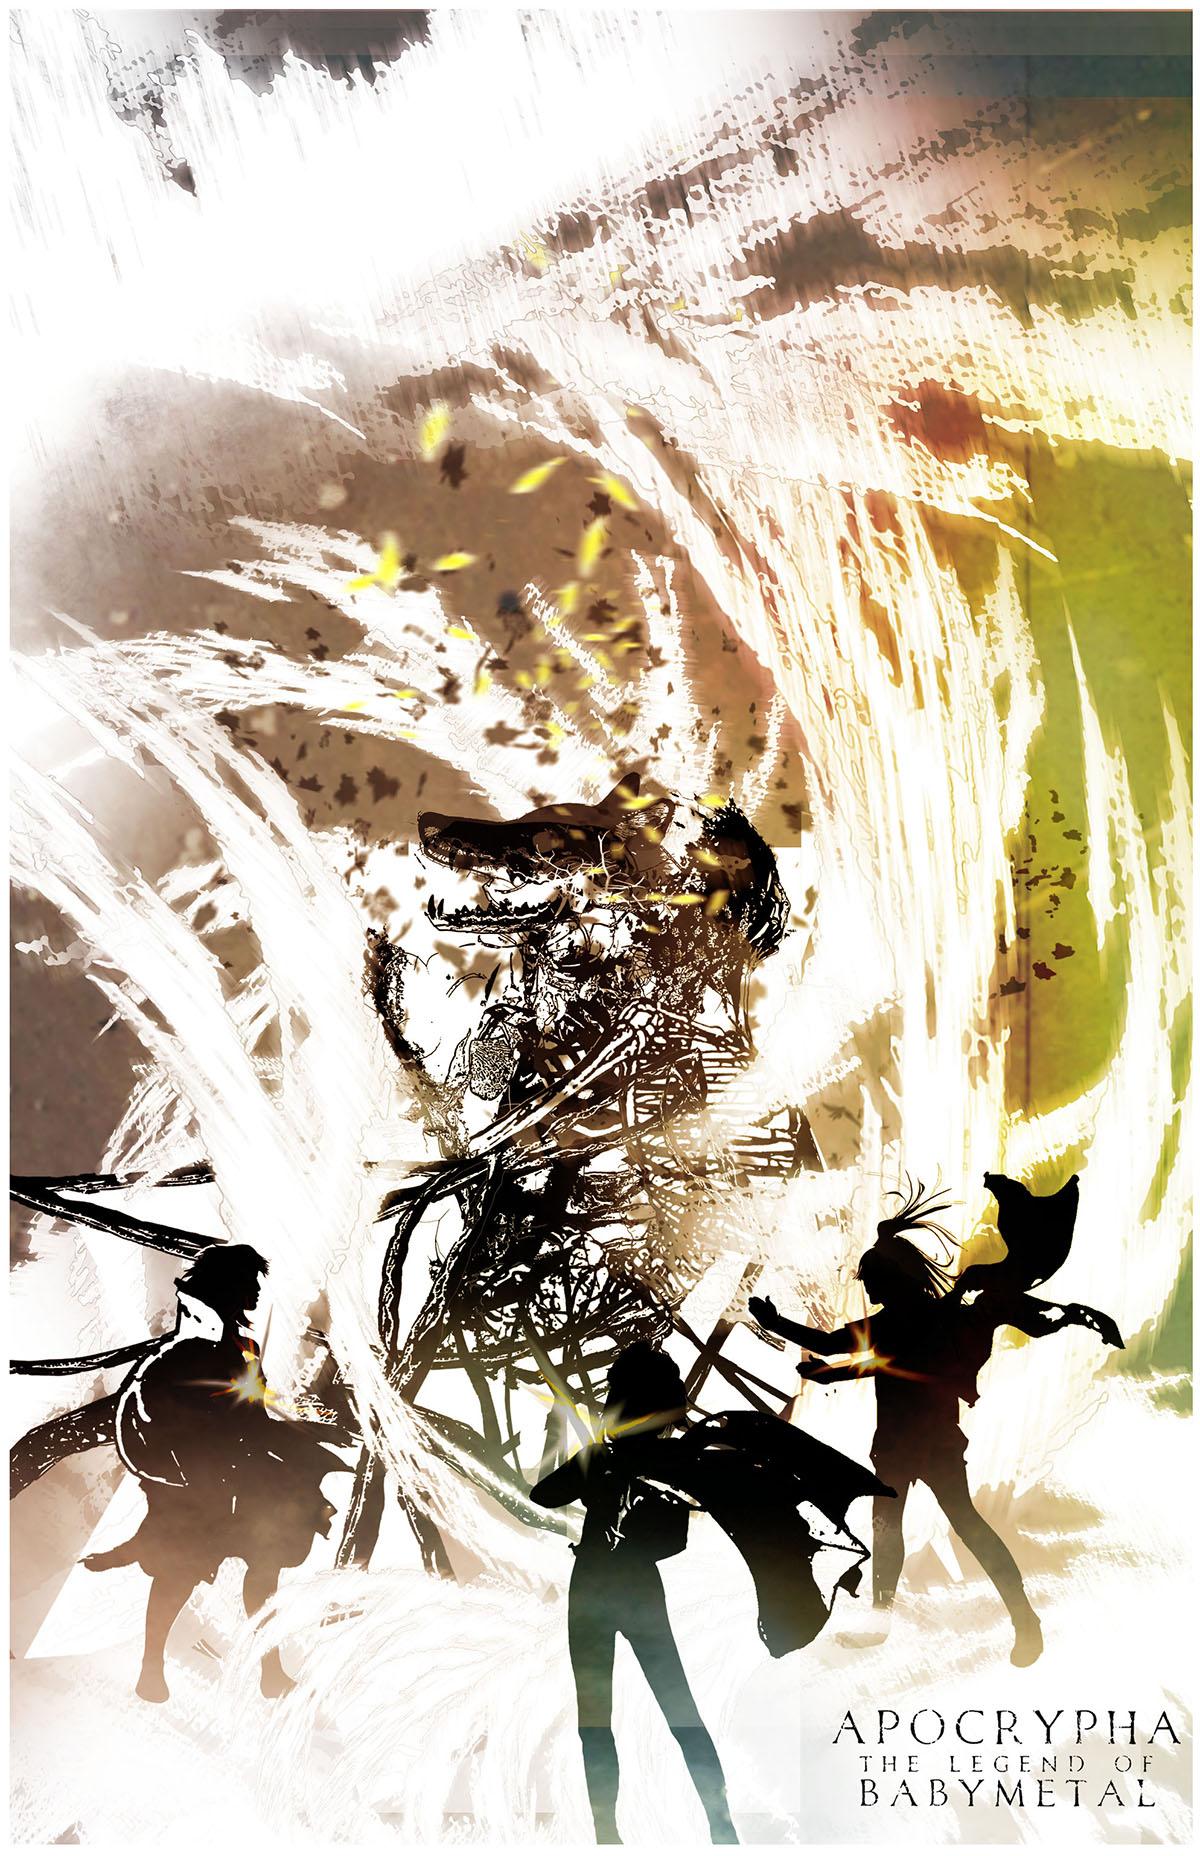 JRock247-BABYMETAL-Apocrypha-Graphic-Novel-review-3